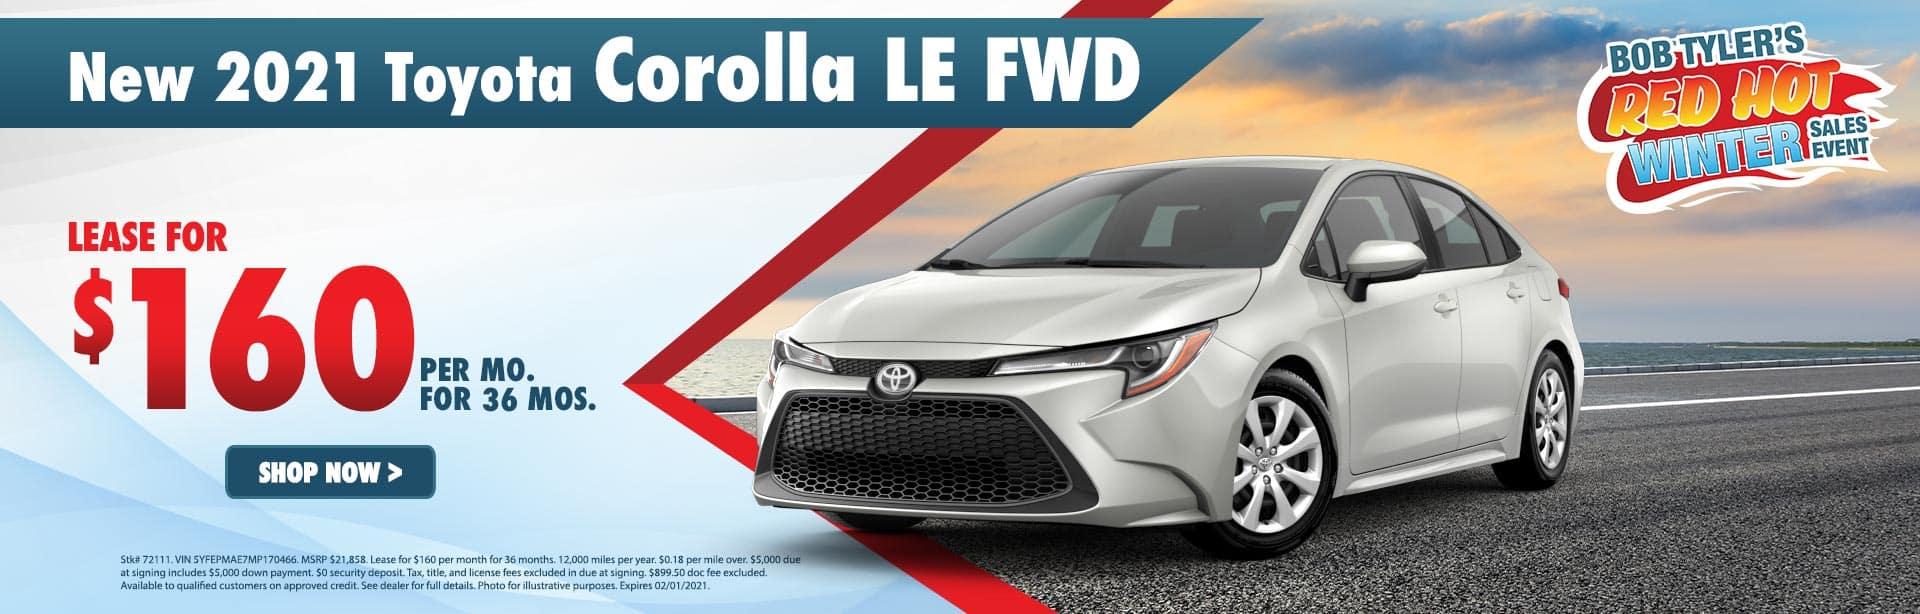 BobTyler_Toyota_webslide_1920x614_01-21_Corolla